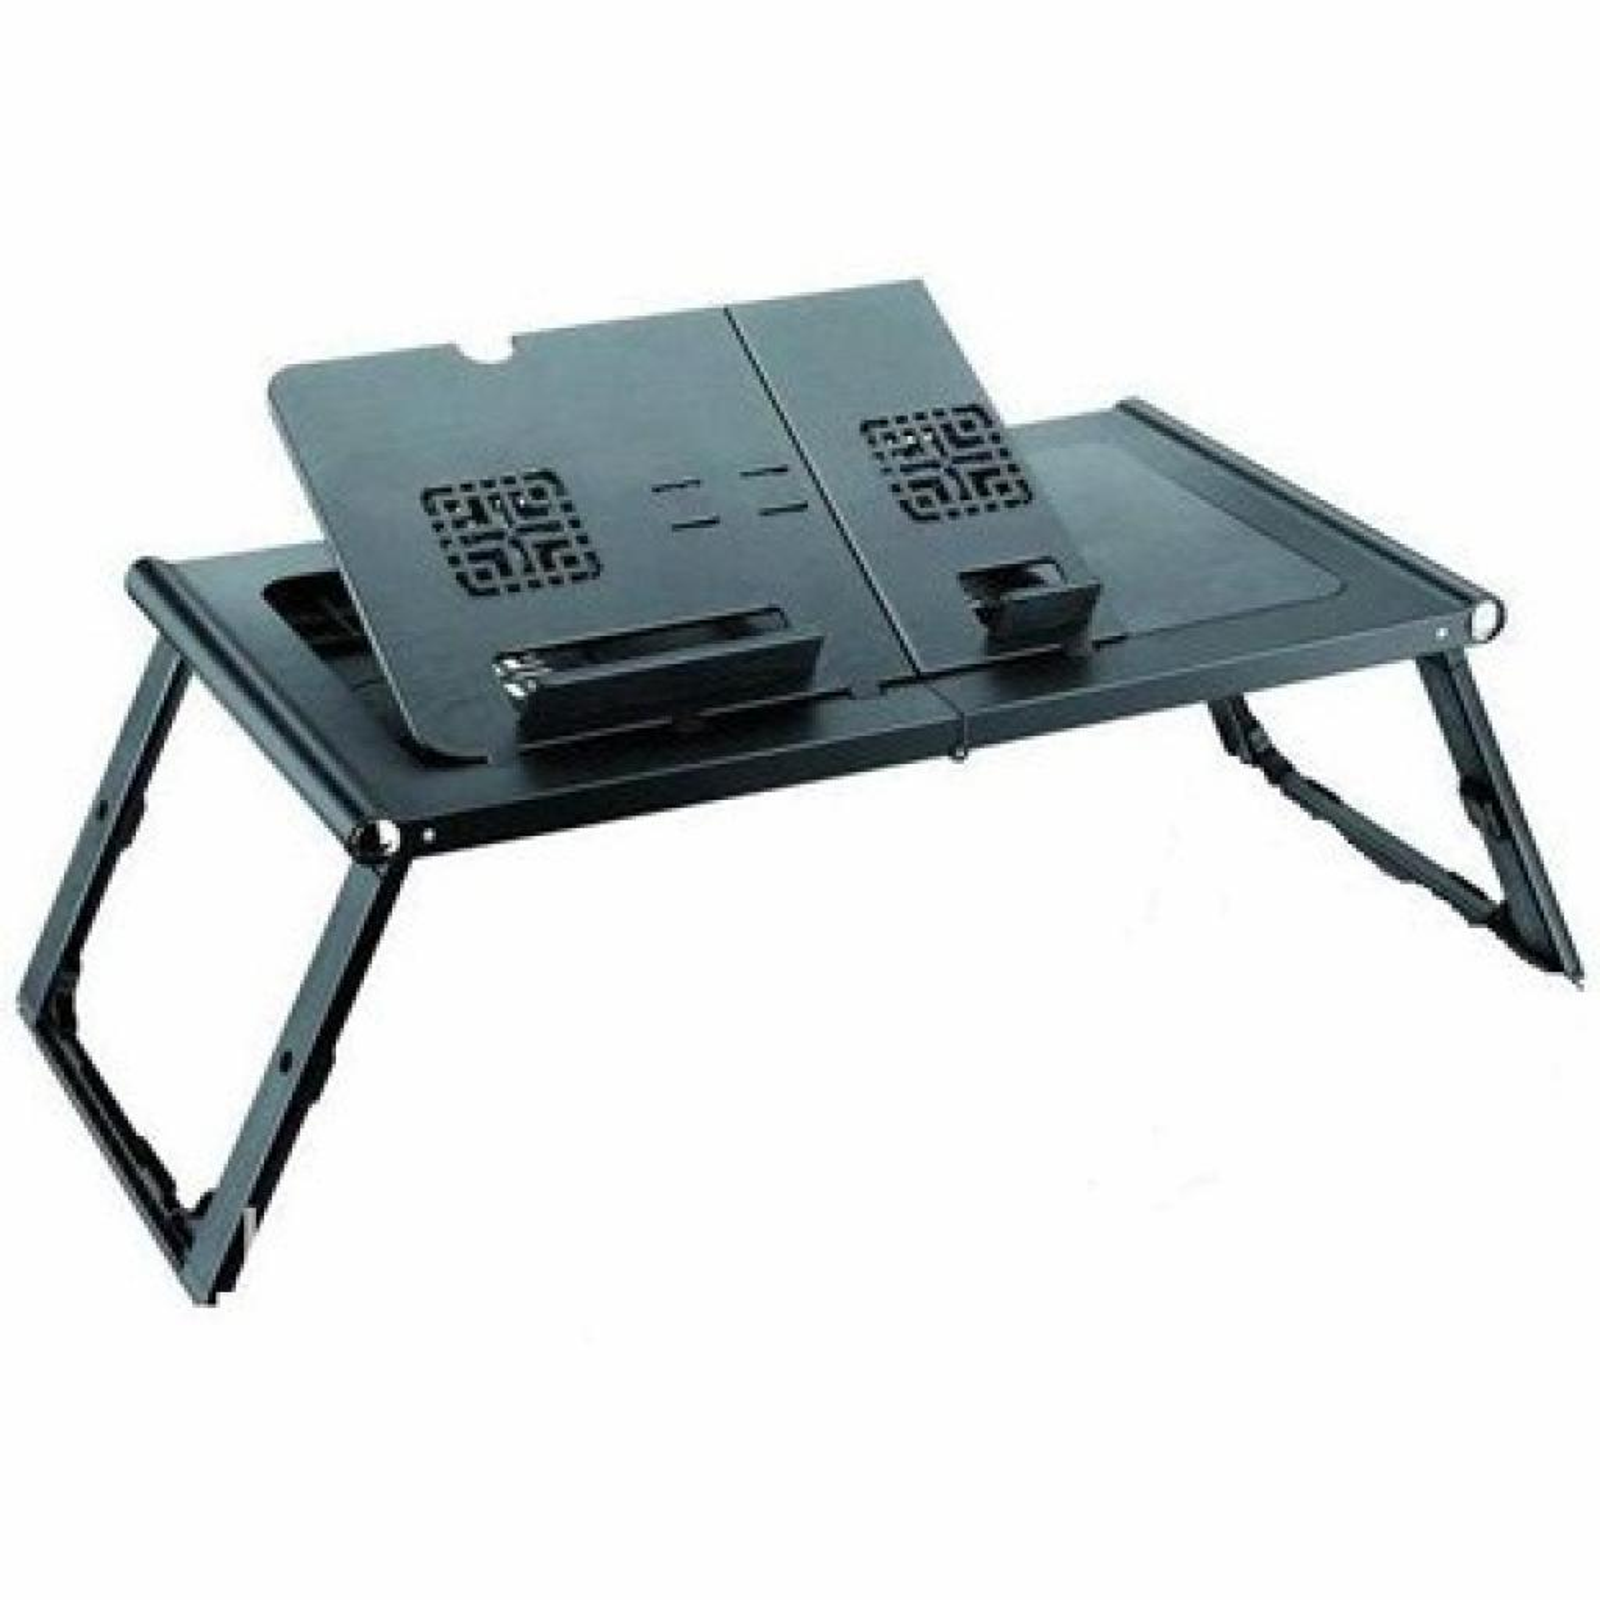 Подставка для ноутбука UFT Т15 black